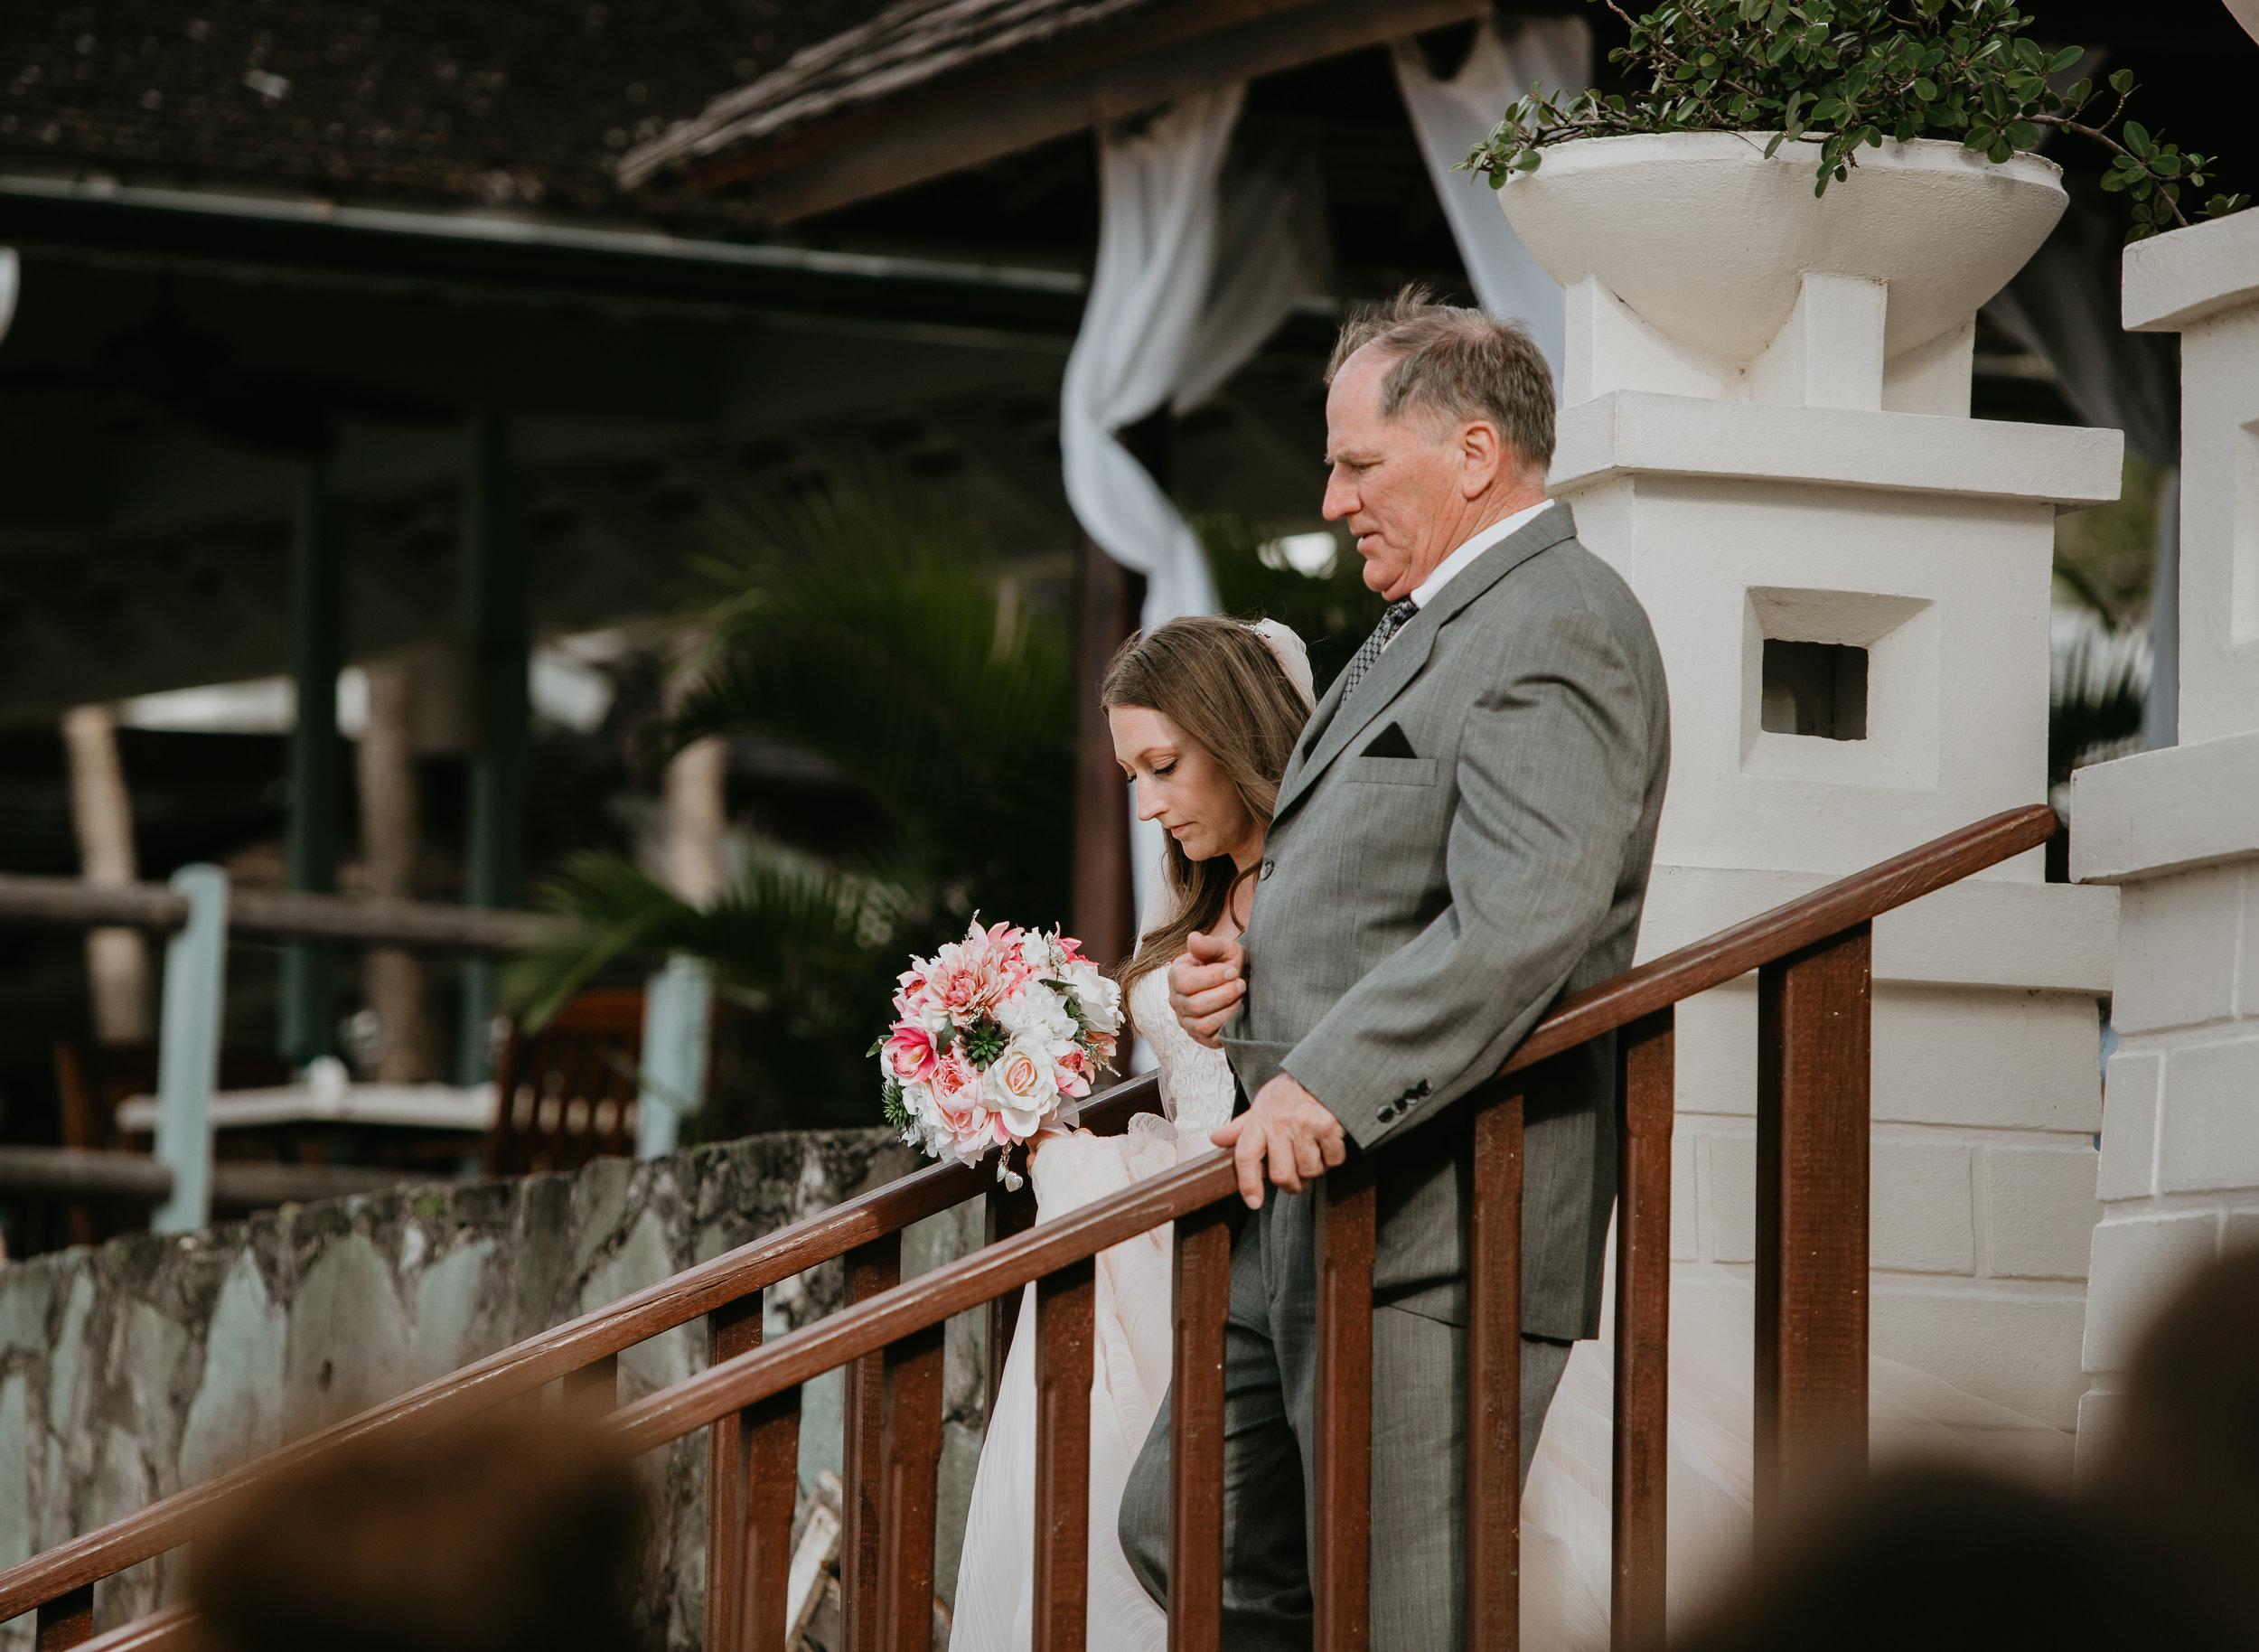 nicole-daacke-photography-destination-wedding-in-st-lucia-sandals-la-toc-intimate-island-wedding-carribean-elopement-photographer-chill-island-wedding-57.jpg